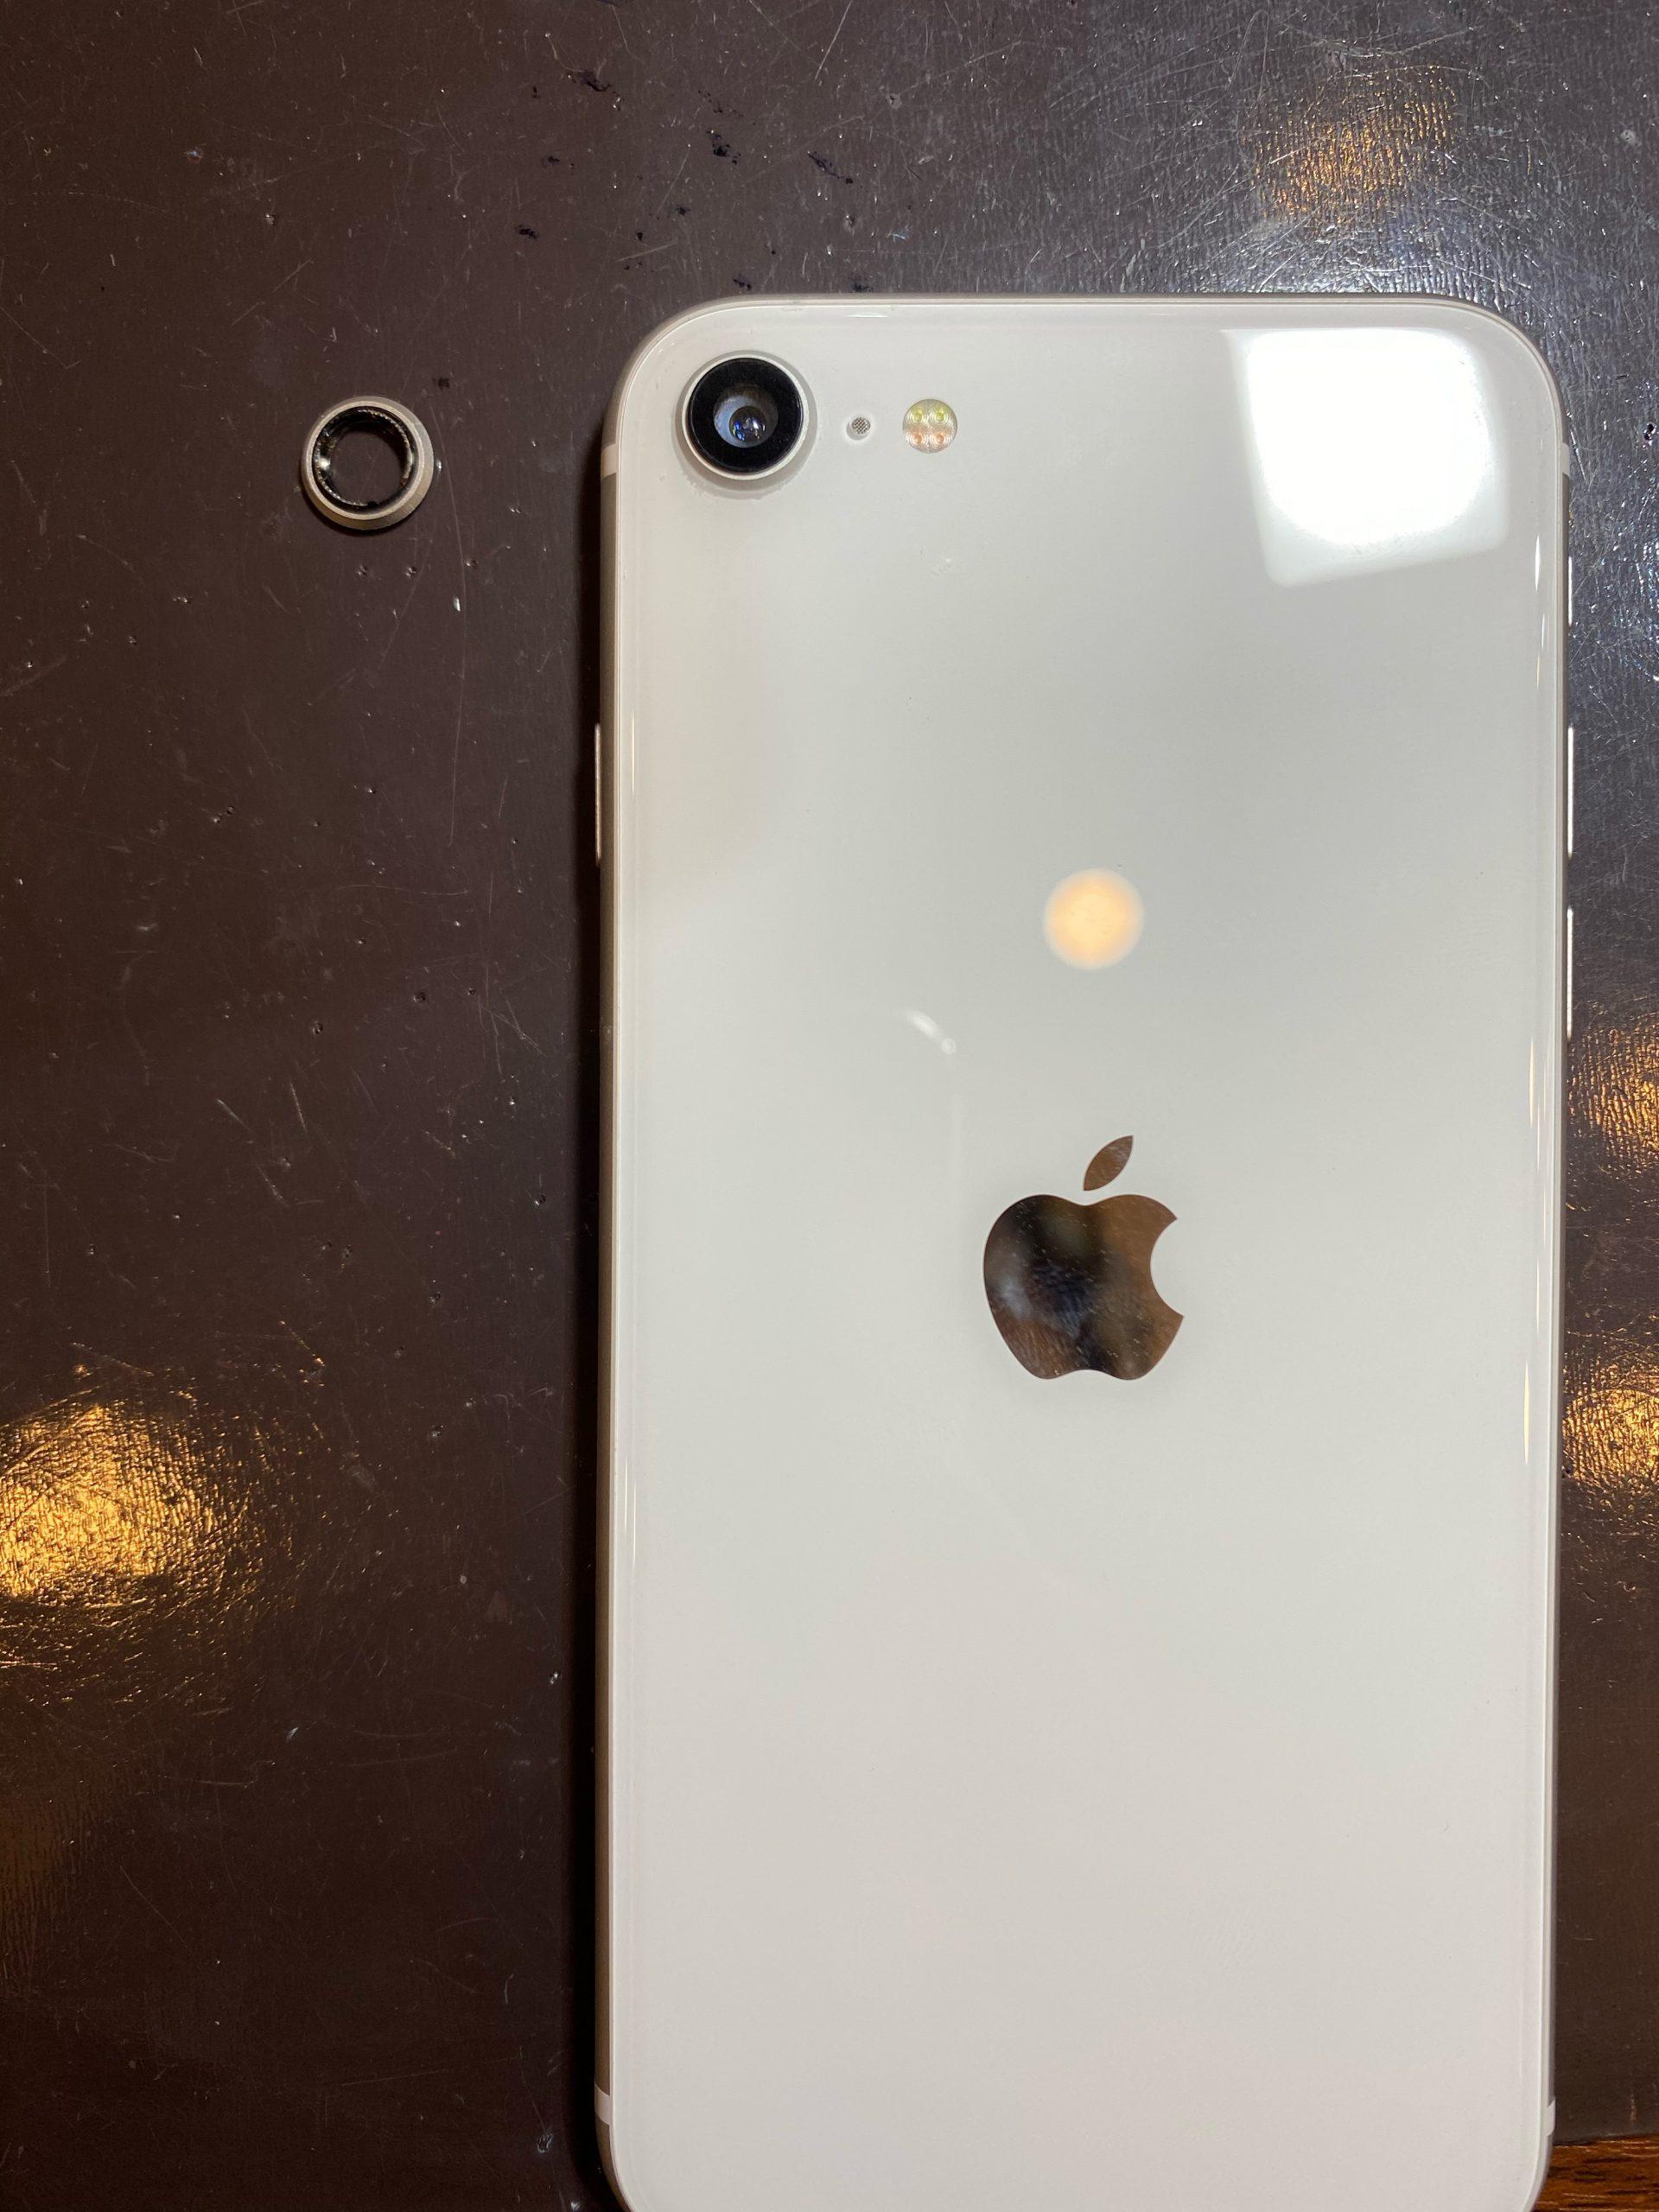 iPhoneSE(第二世代) カメラレンズ修理|伊丹市よりご来店 So